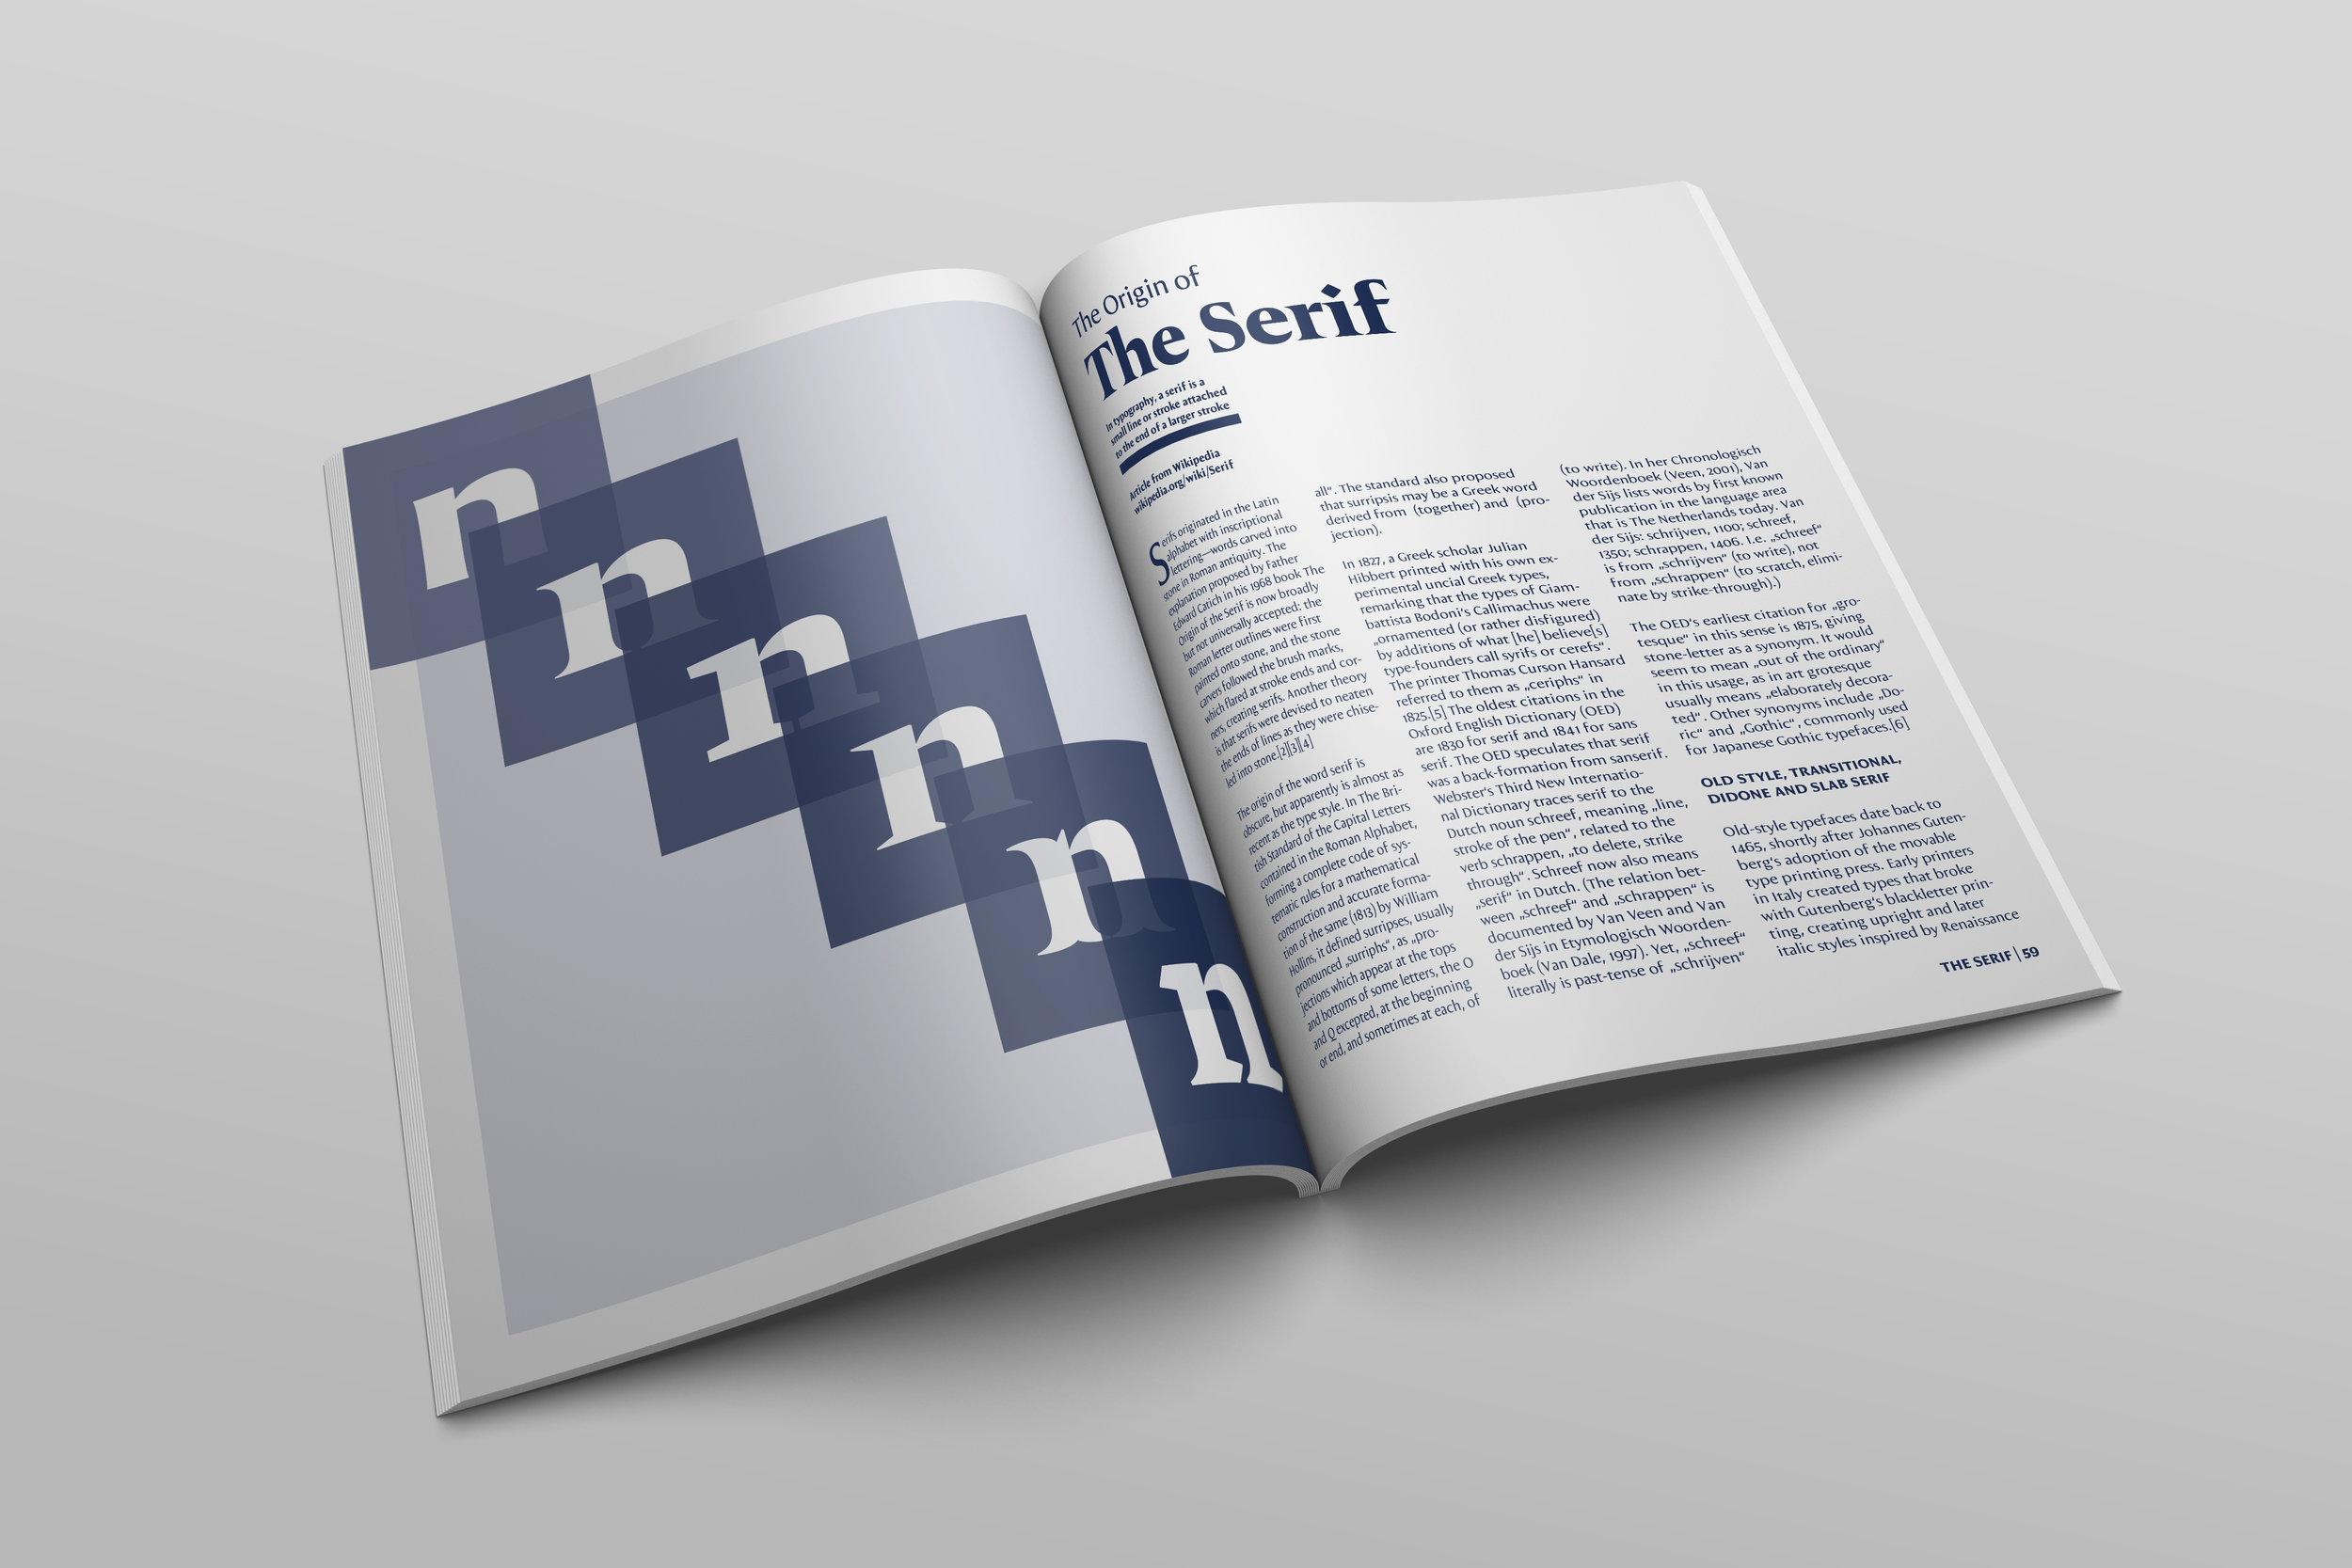 MagazineSpreadBvolmer.jpg